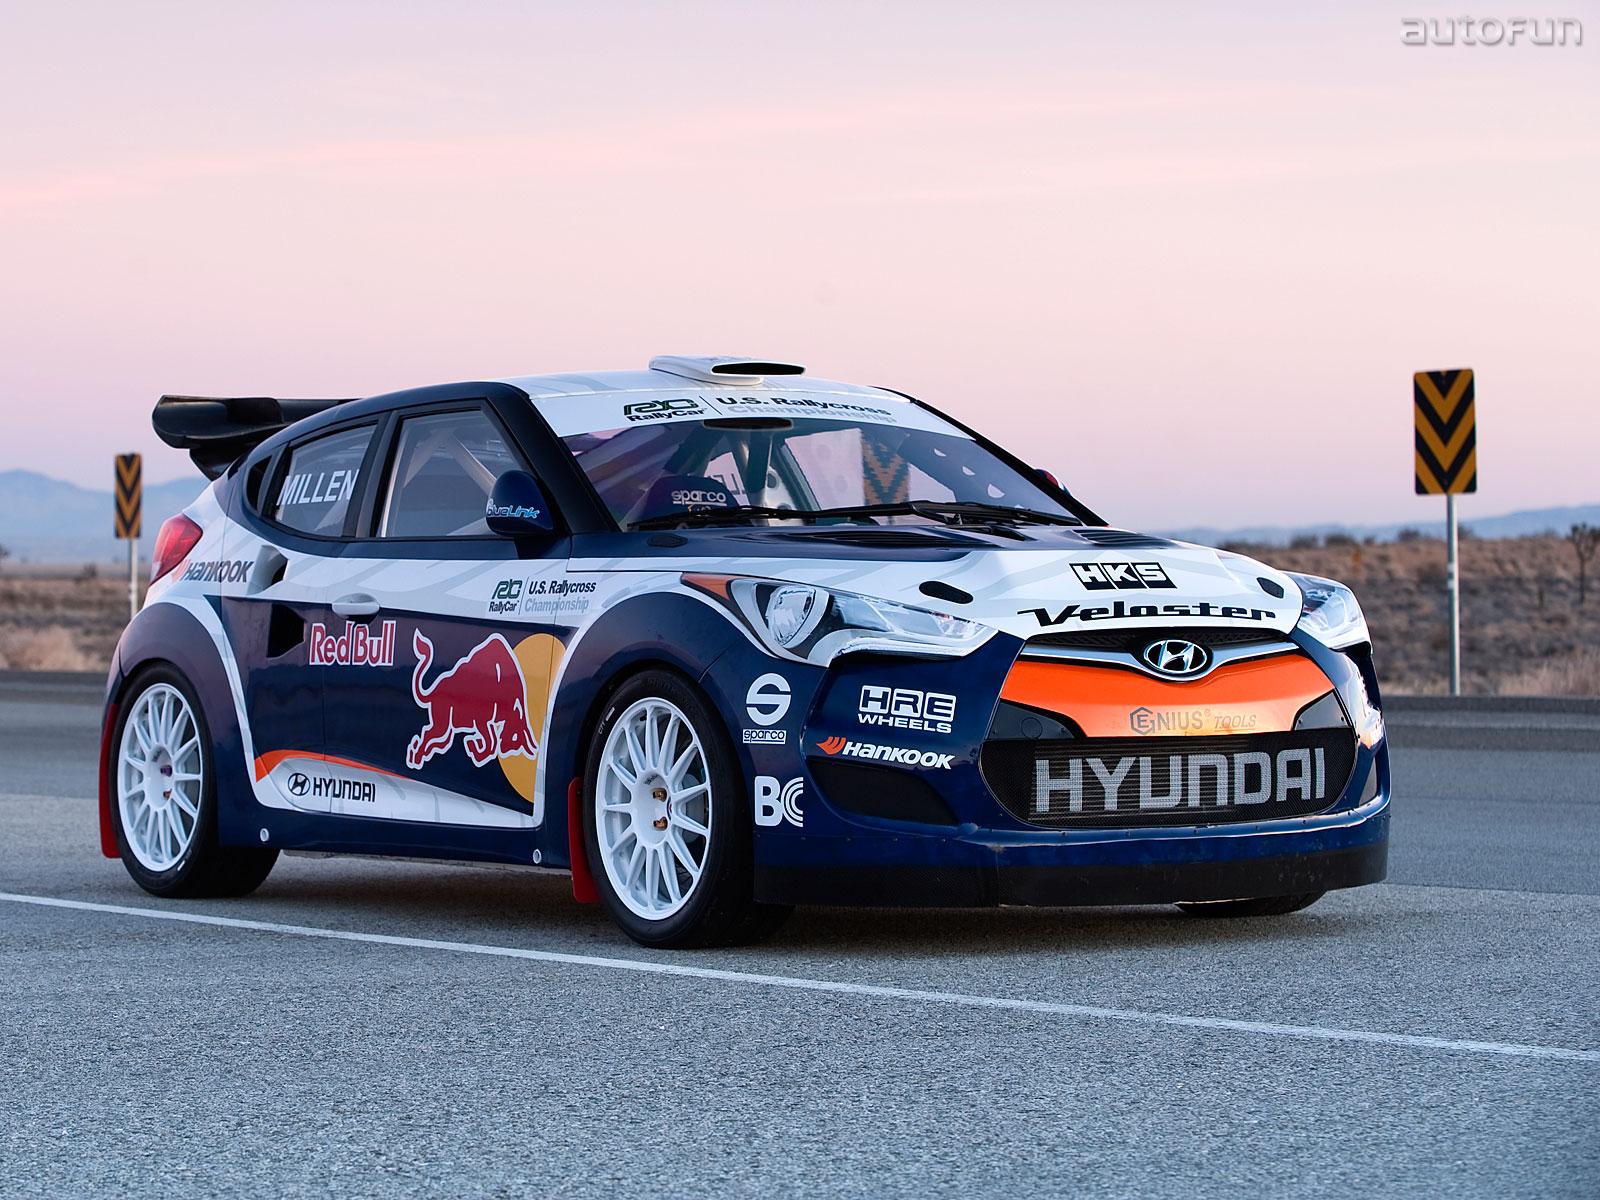 Hyundai Veloster Rally